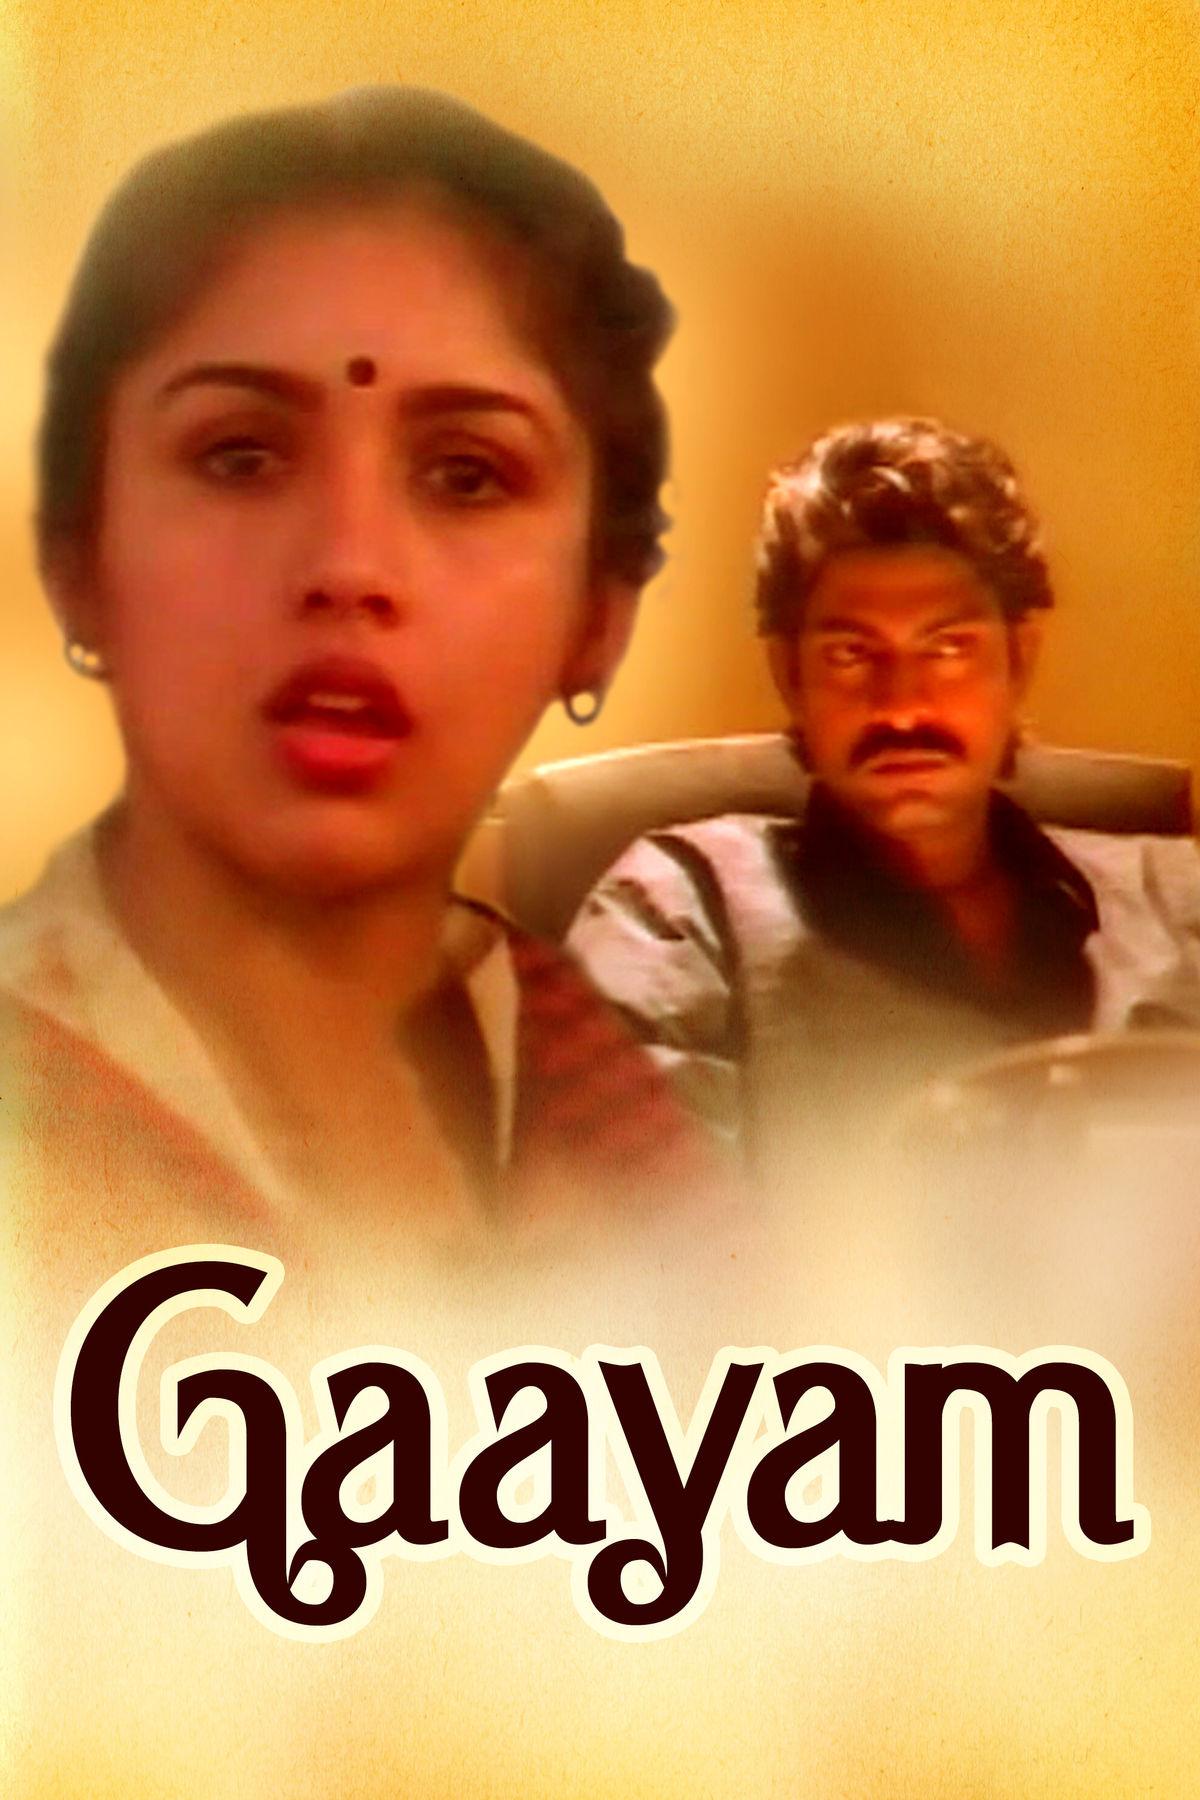 Sirivennela Seetharama Sastry Best Movies, TV Shows and Web Series List